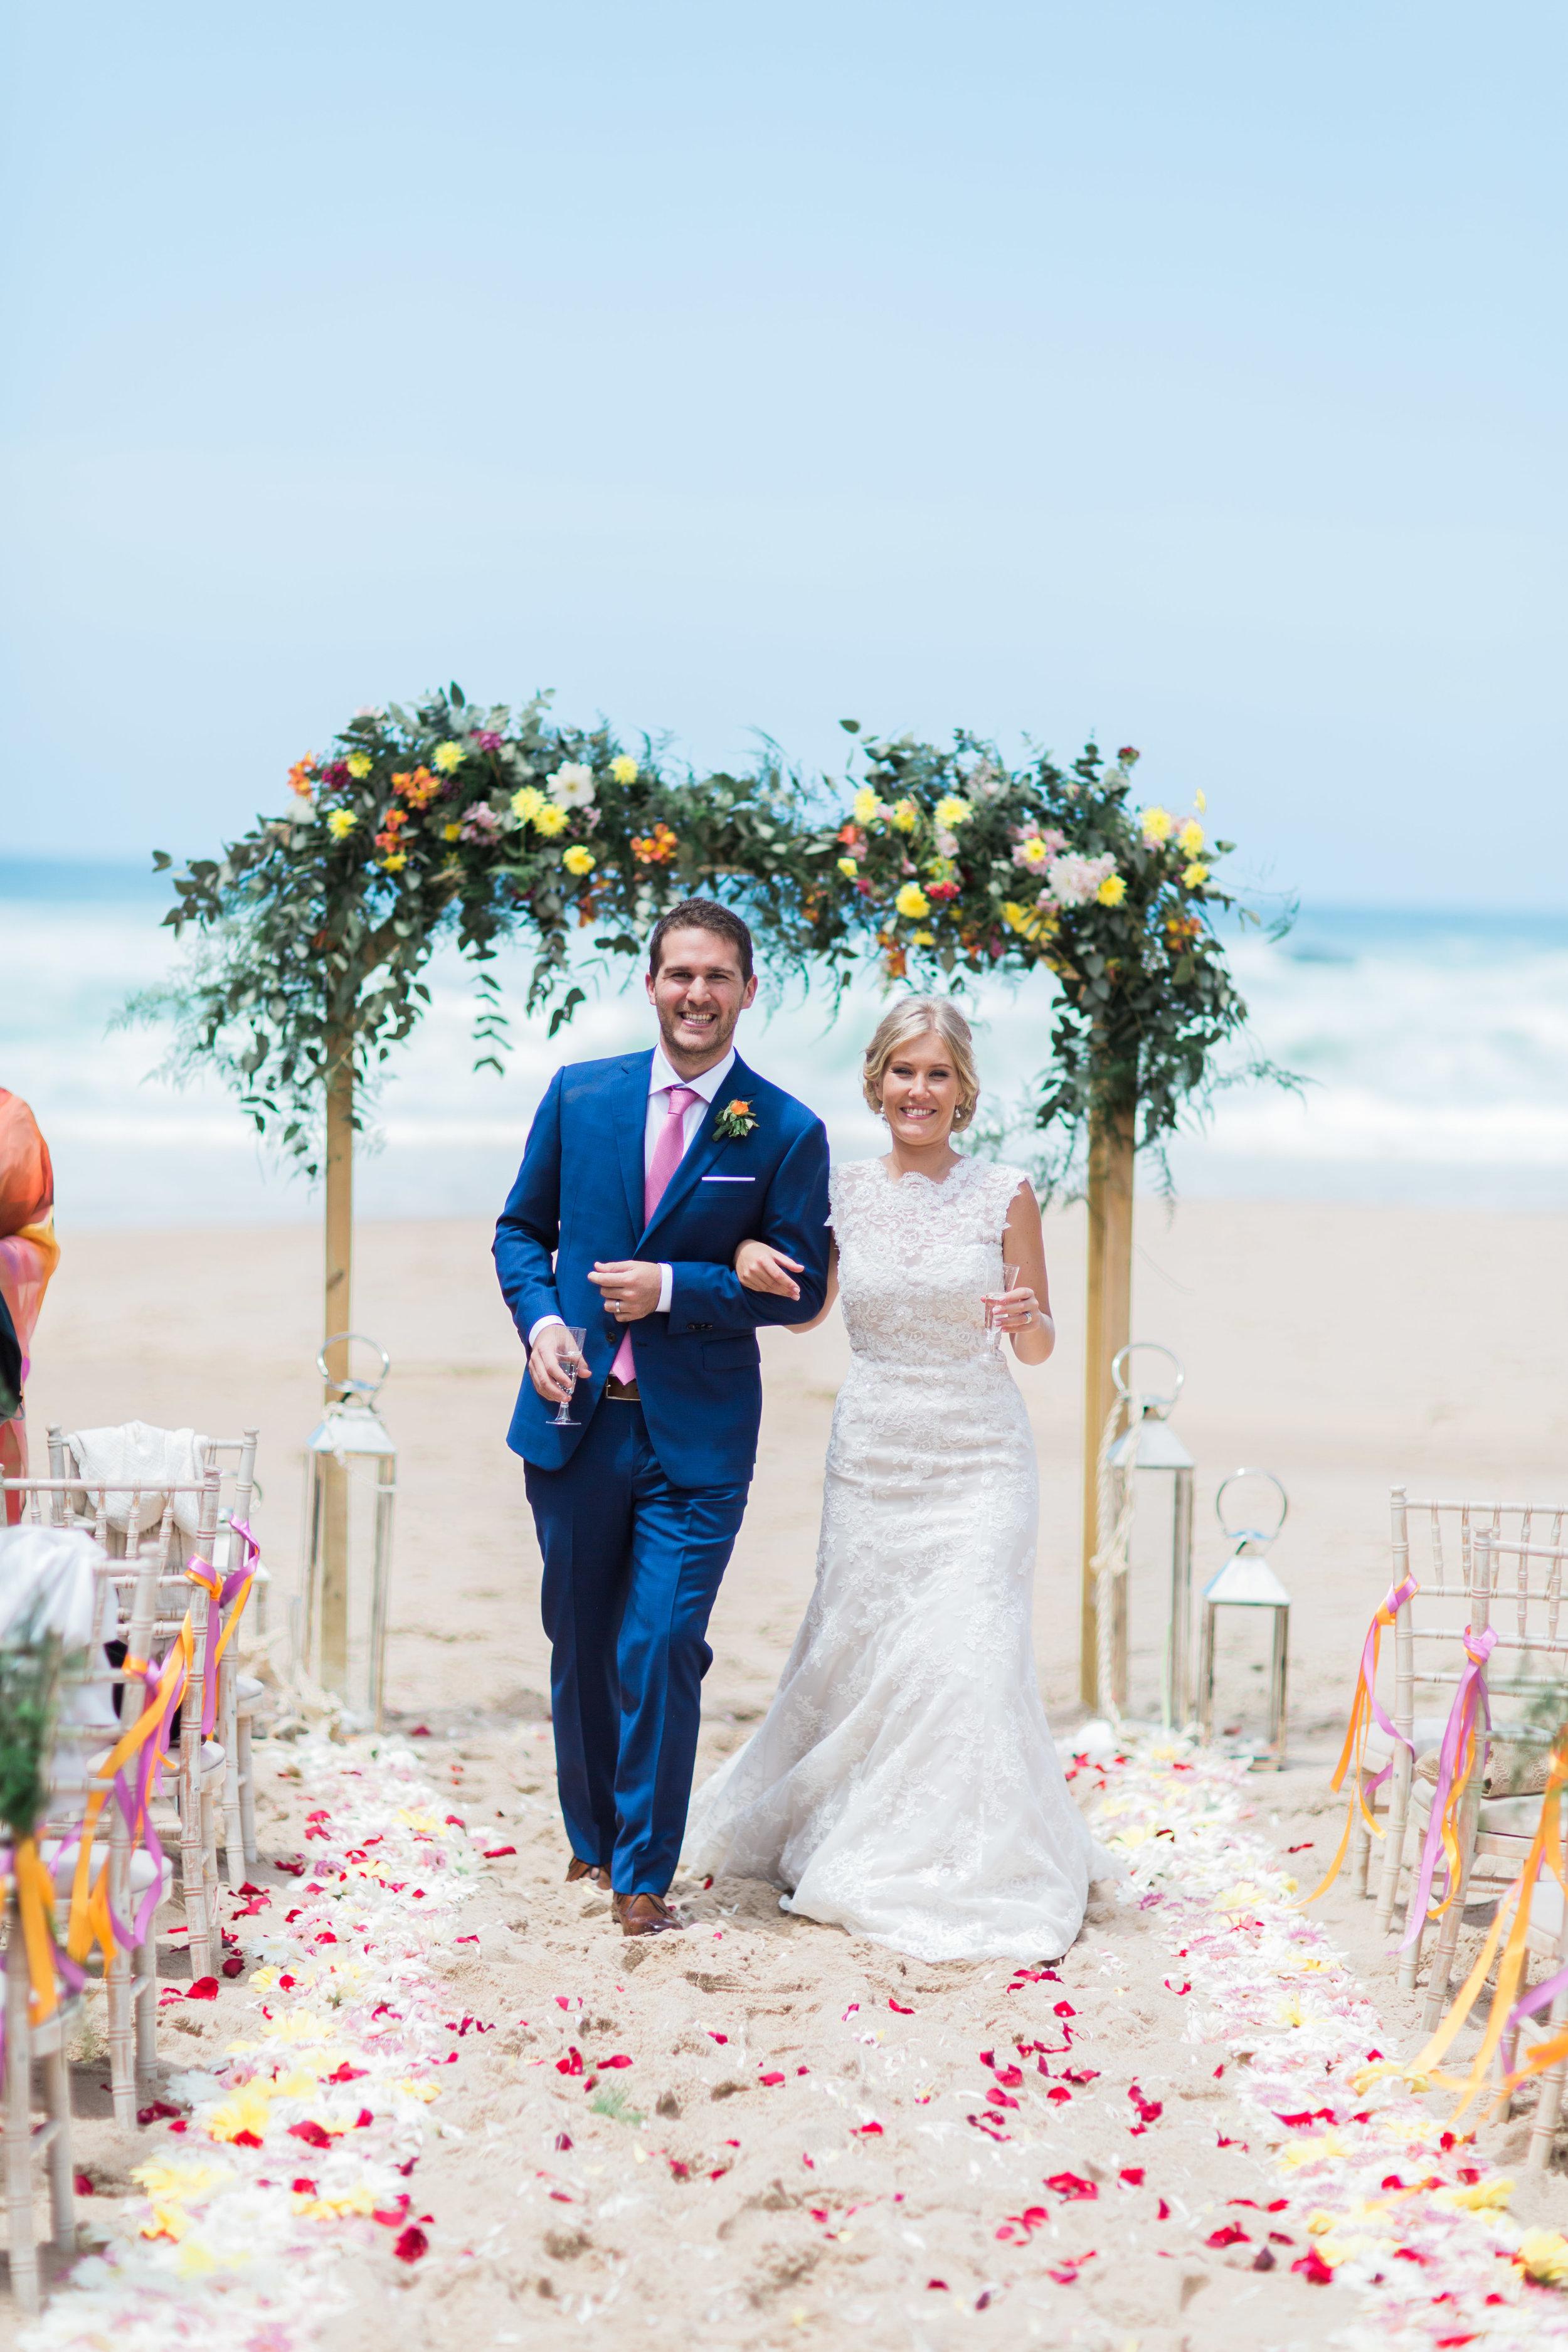 mariaraophotography-sintra-wedding-231.jpg